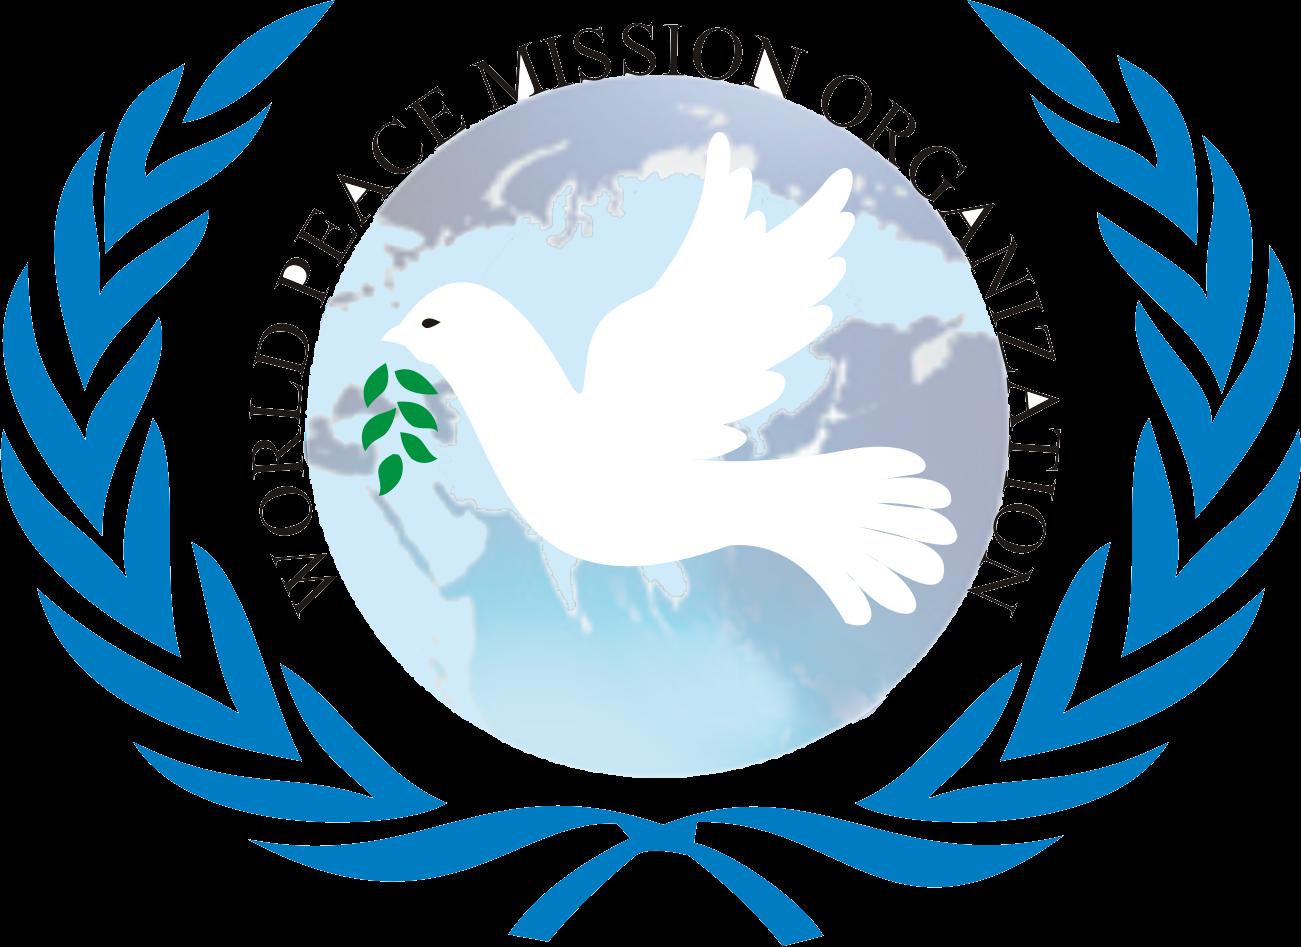 world peace and non violence essay